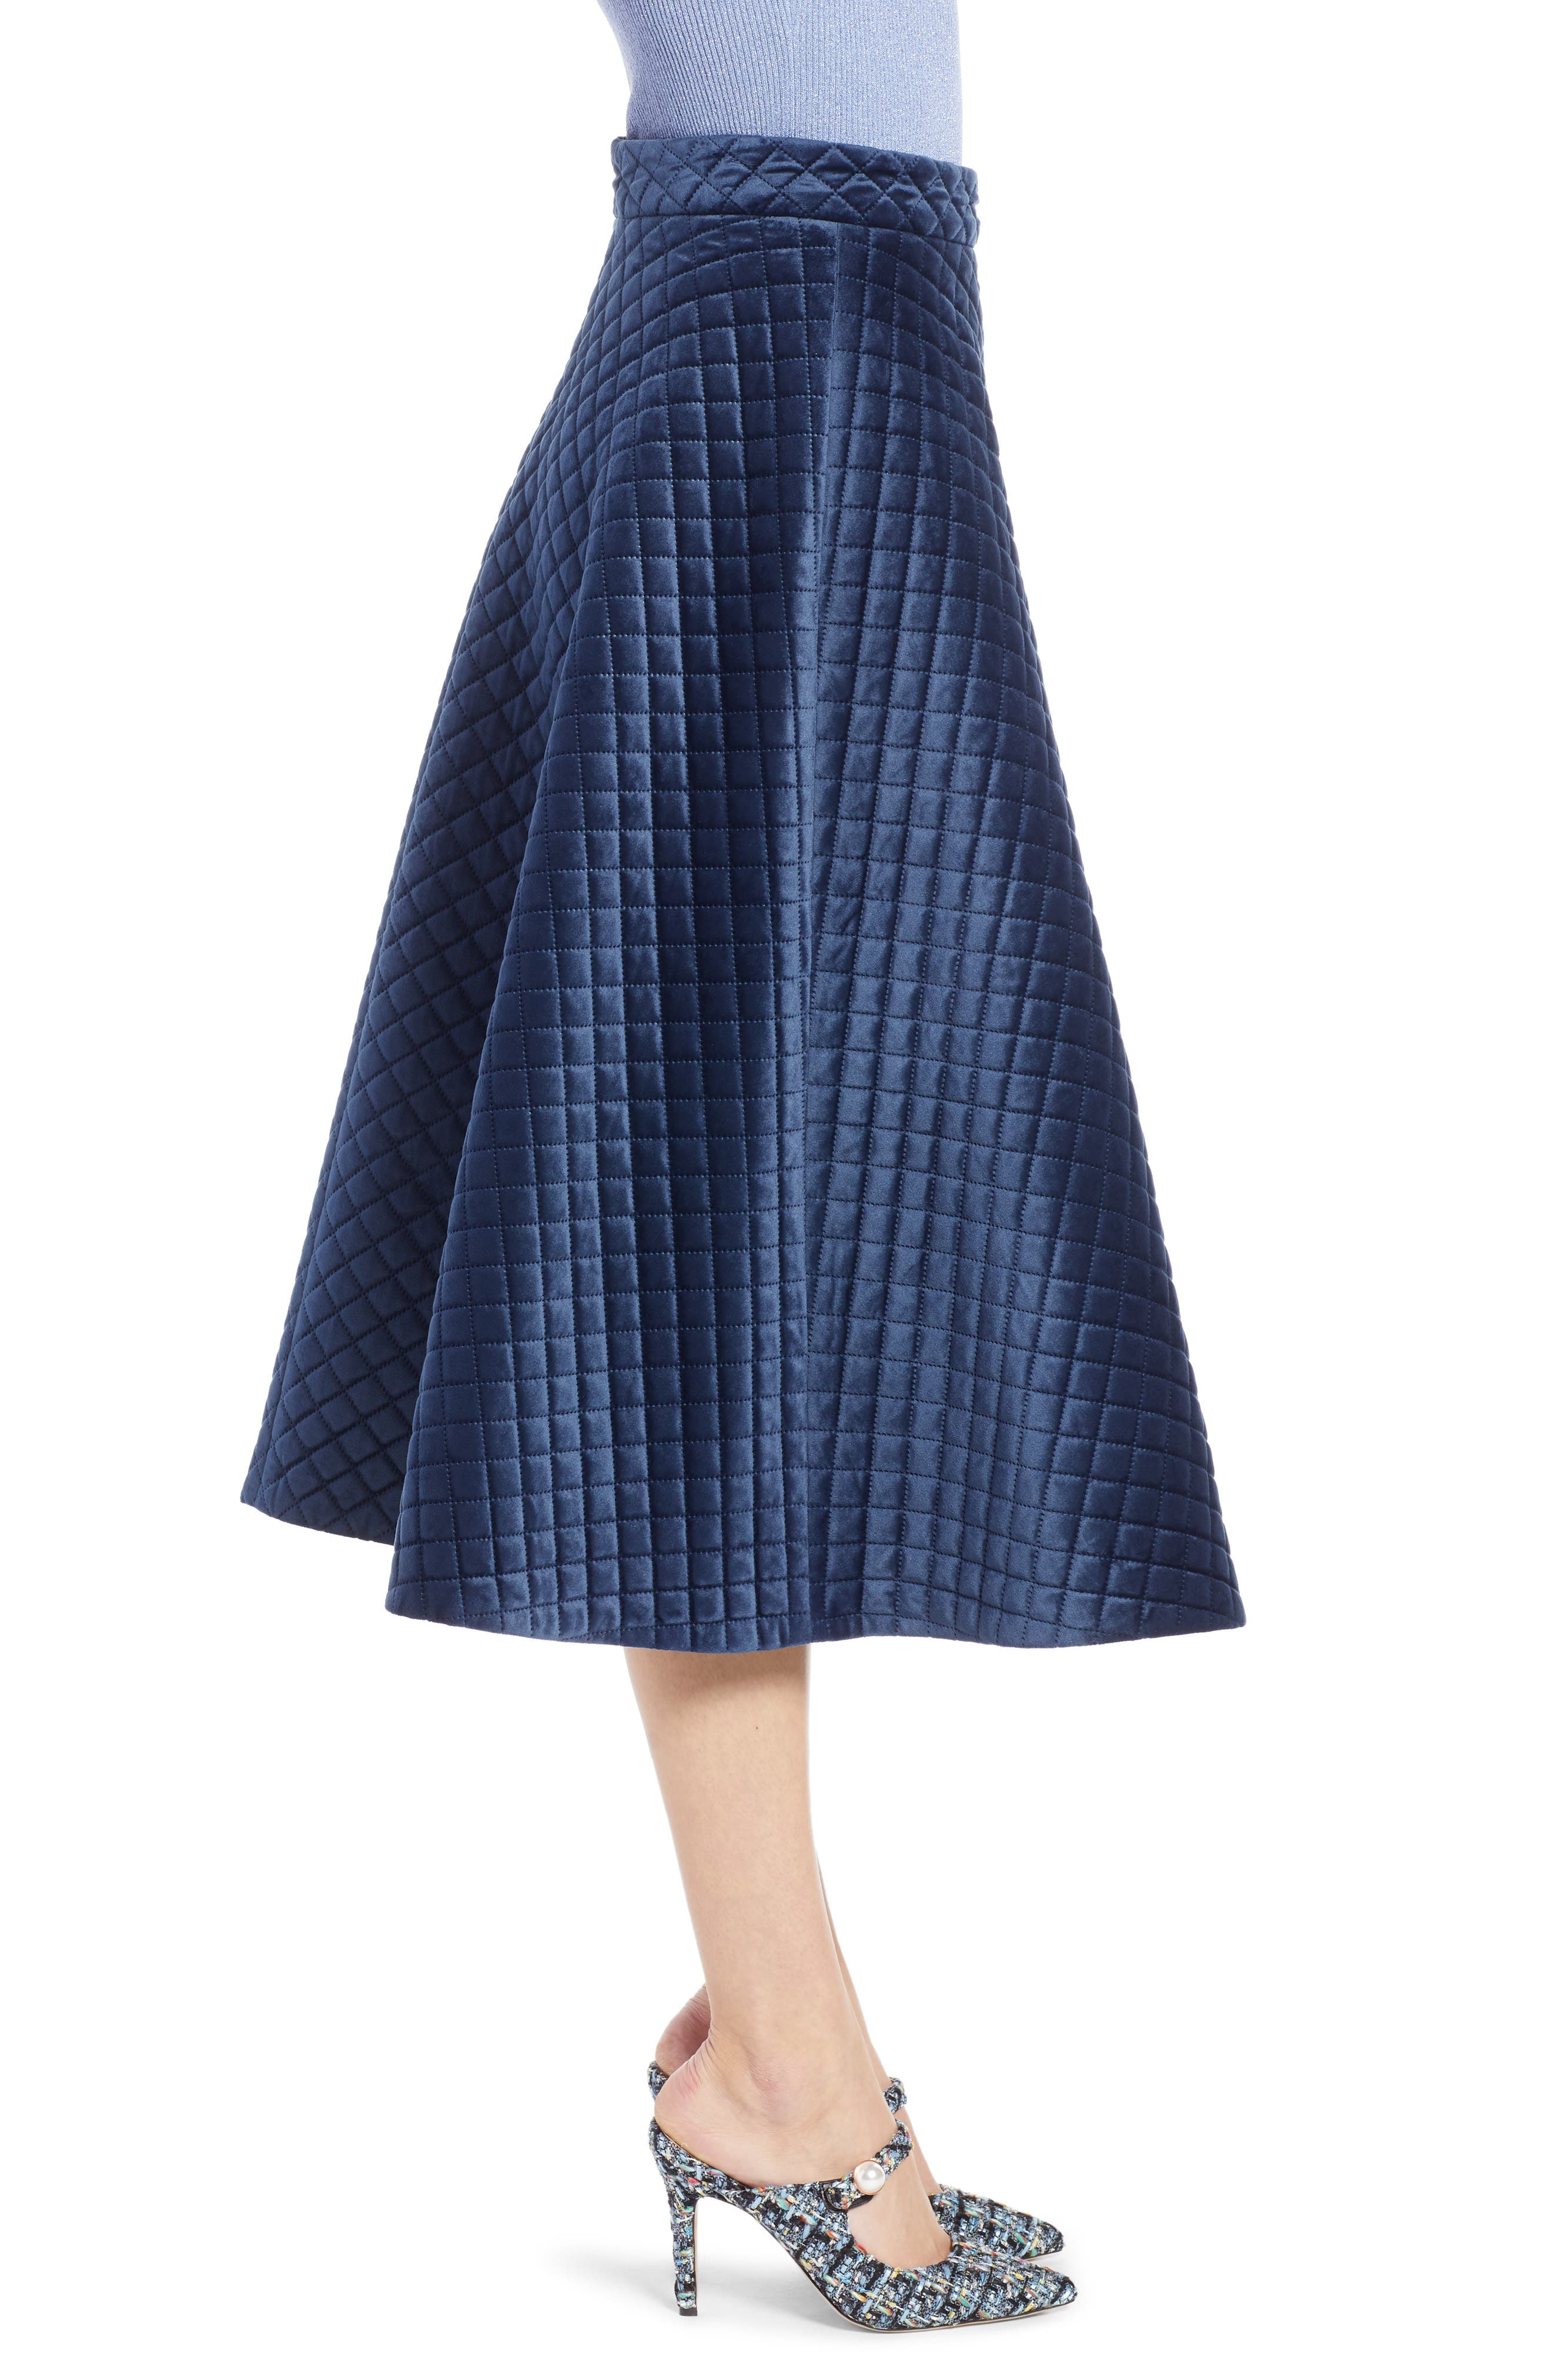 x Atlantic-Pacific Quilted Velour Circle Midi Skirt,                             Alternate thumbnail 4, color,                             NAVY BLAZER